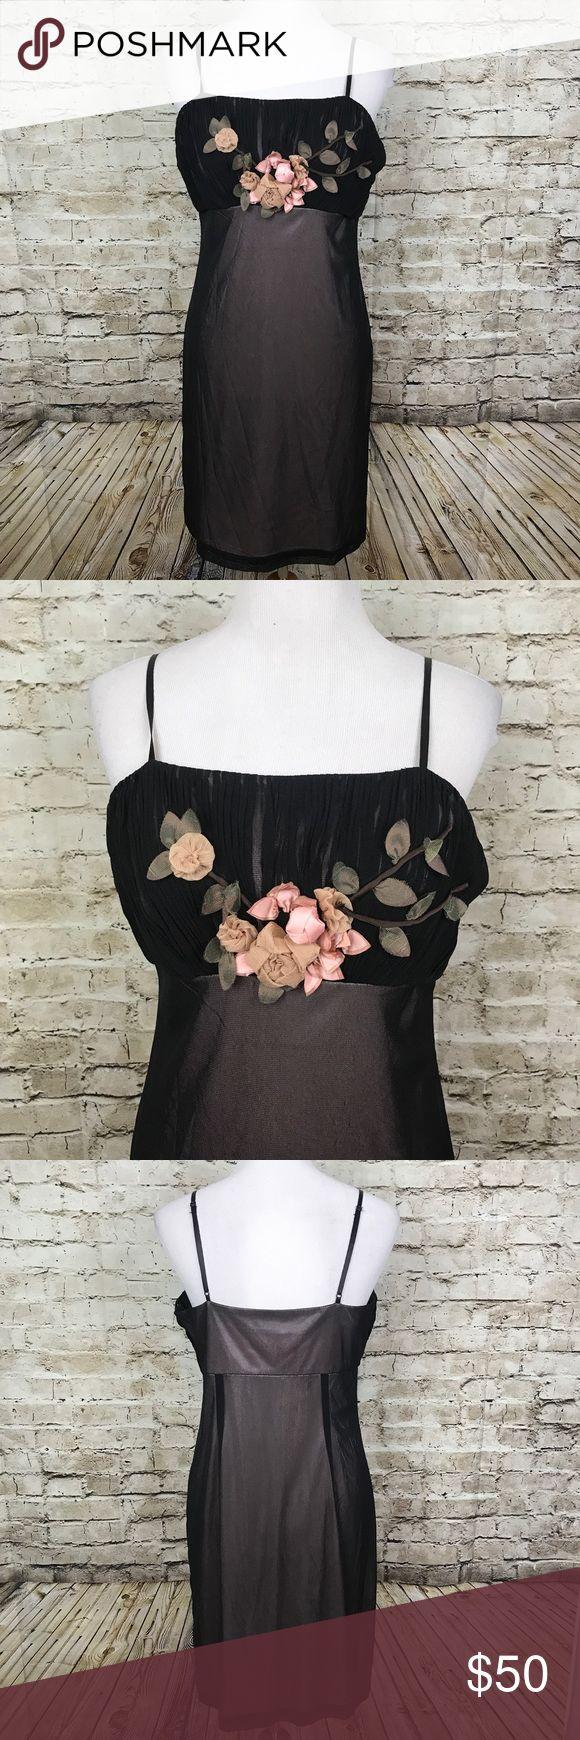 "Studios W by Sue Wong Size 12 Dress Sheer Bodycon Studios W by Sue Wong Size 12 Dress Sheer Bodycon Black Floral Applique Nylon  36"" shoulder to hem and 18"" armpit to armpit Sue Wong Dresses"